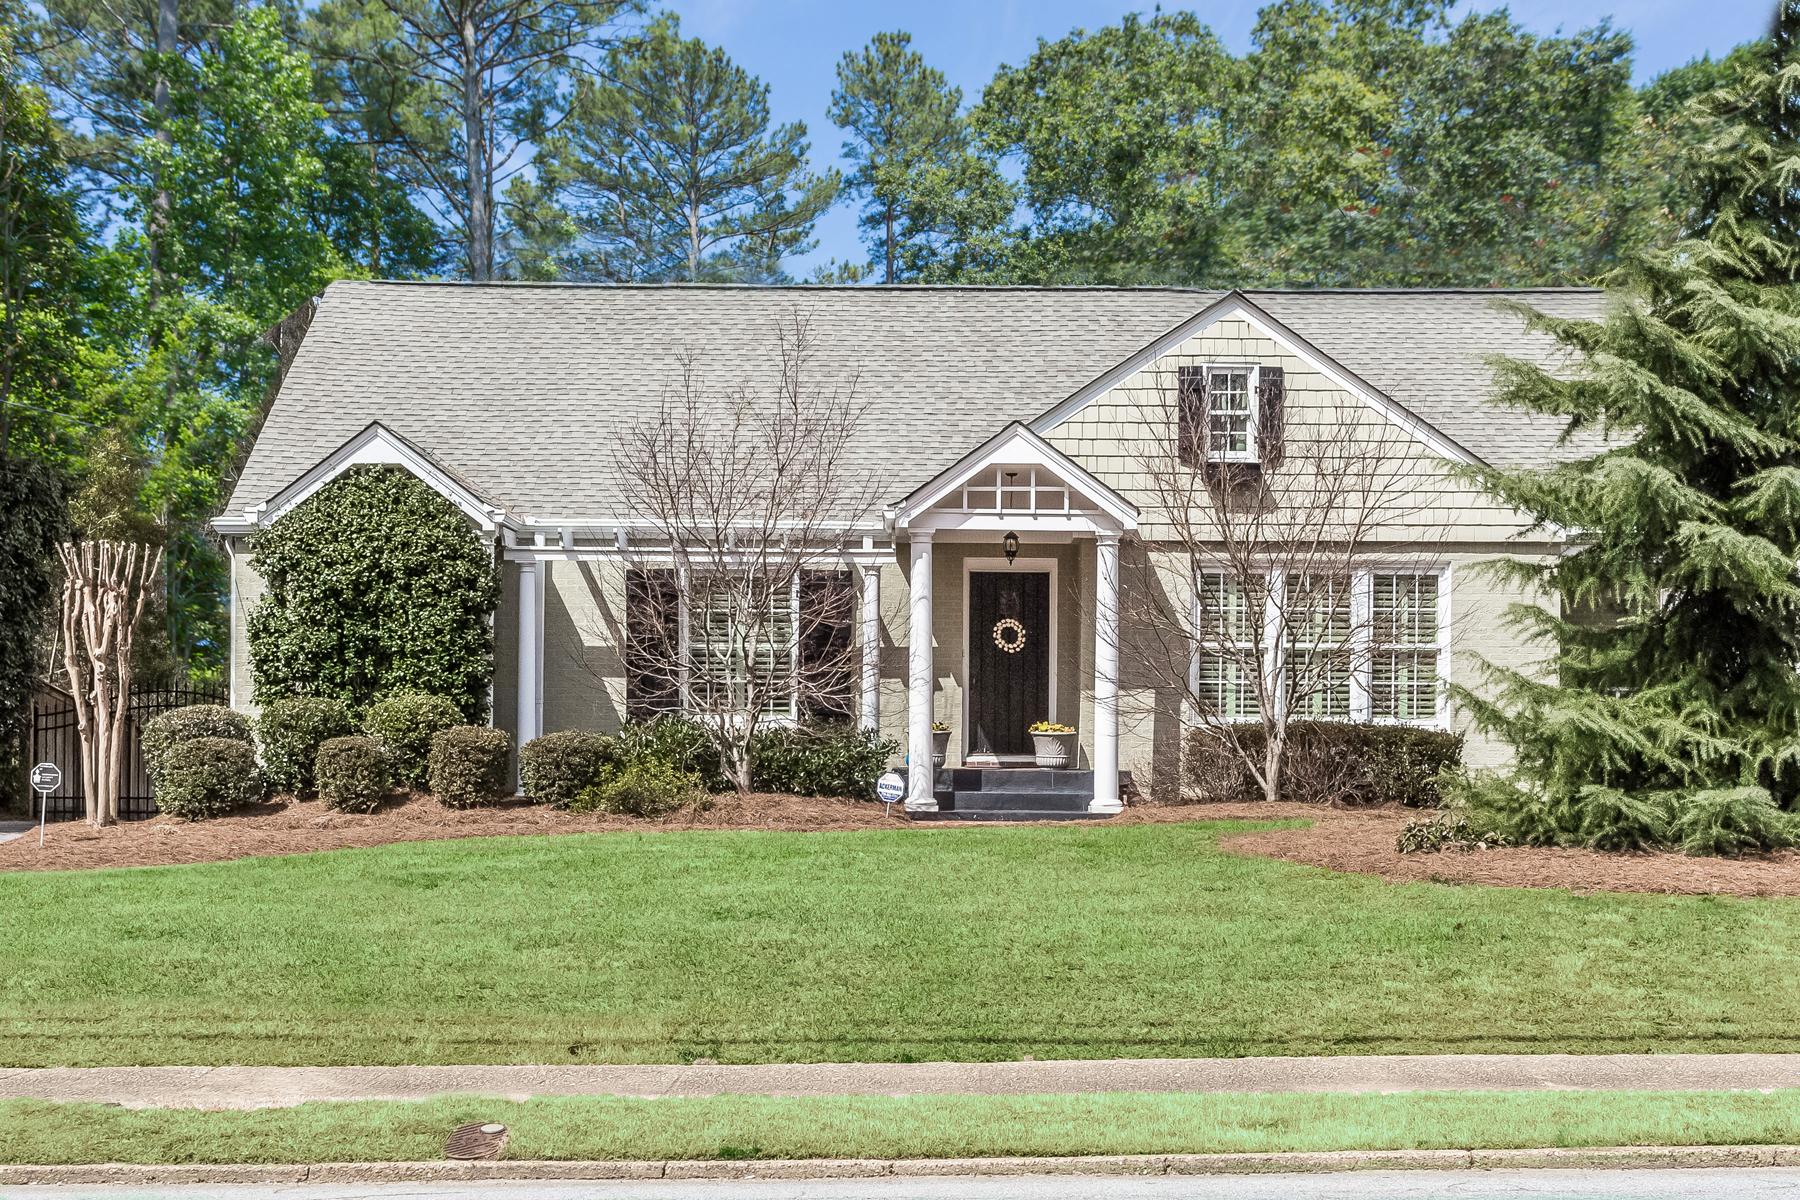 Moradia para Venda às Cape Cod Home in Sought After Morningside 1738 Johnson Road Atlanta, Geórgia, 30306 Estados Unidos